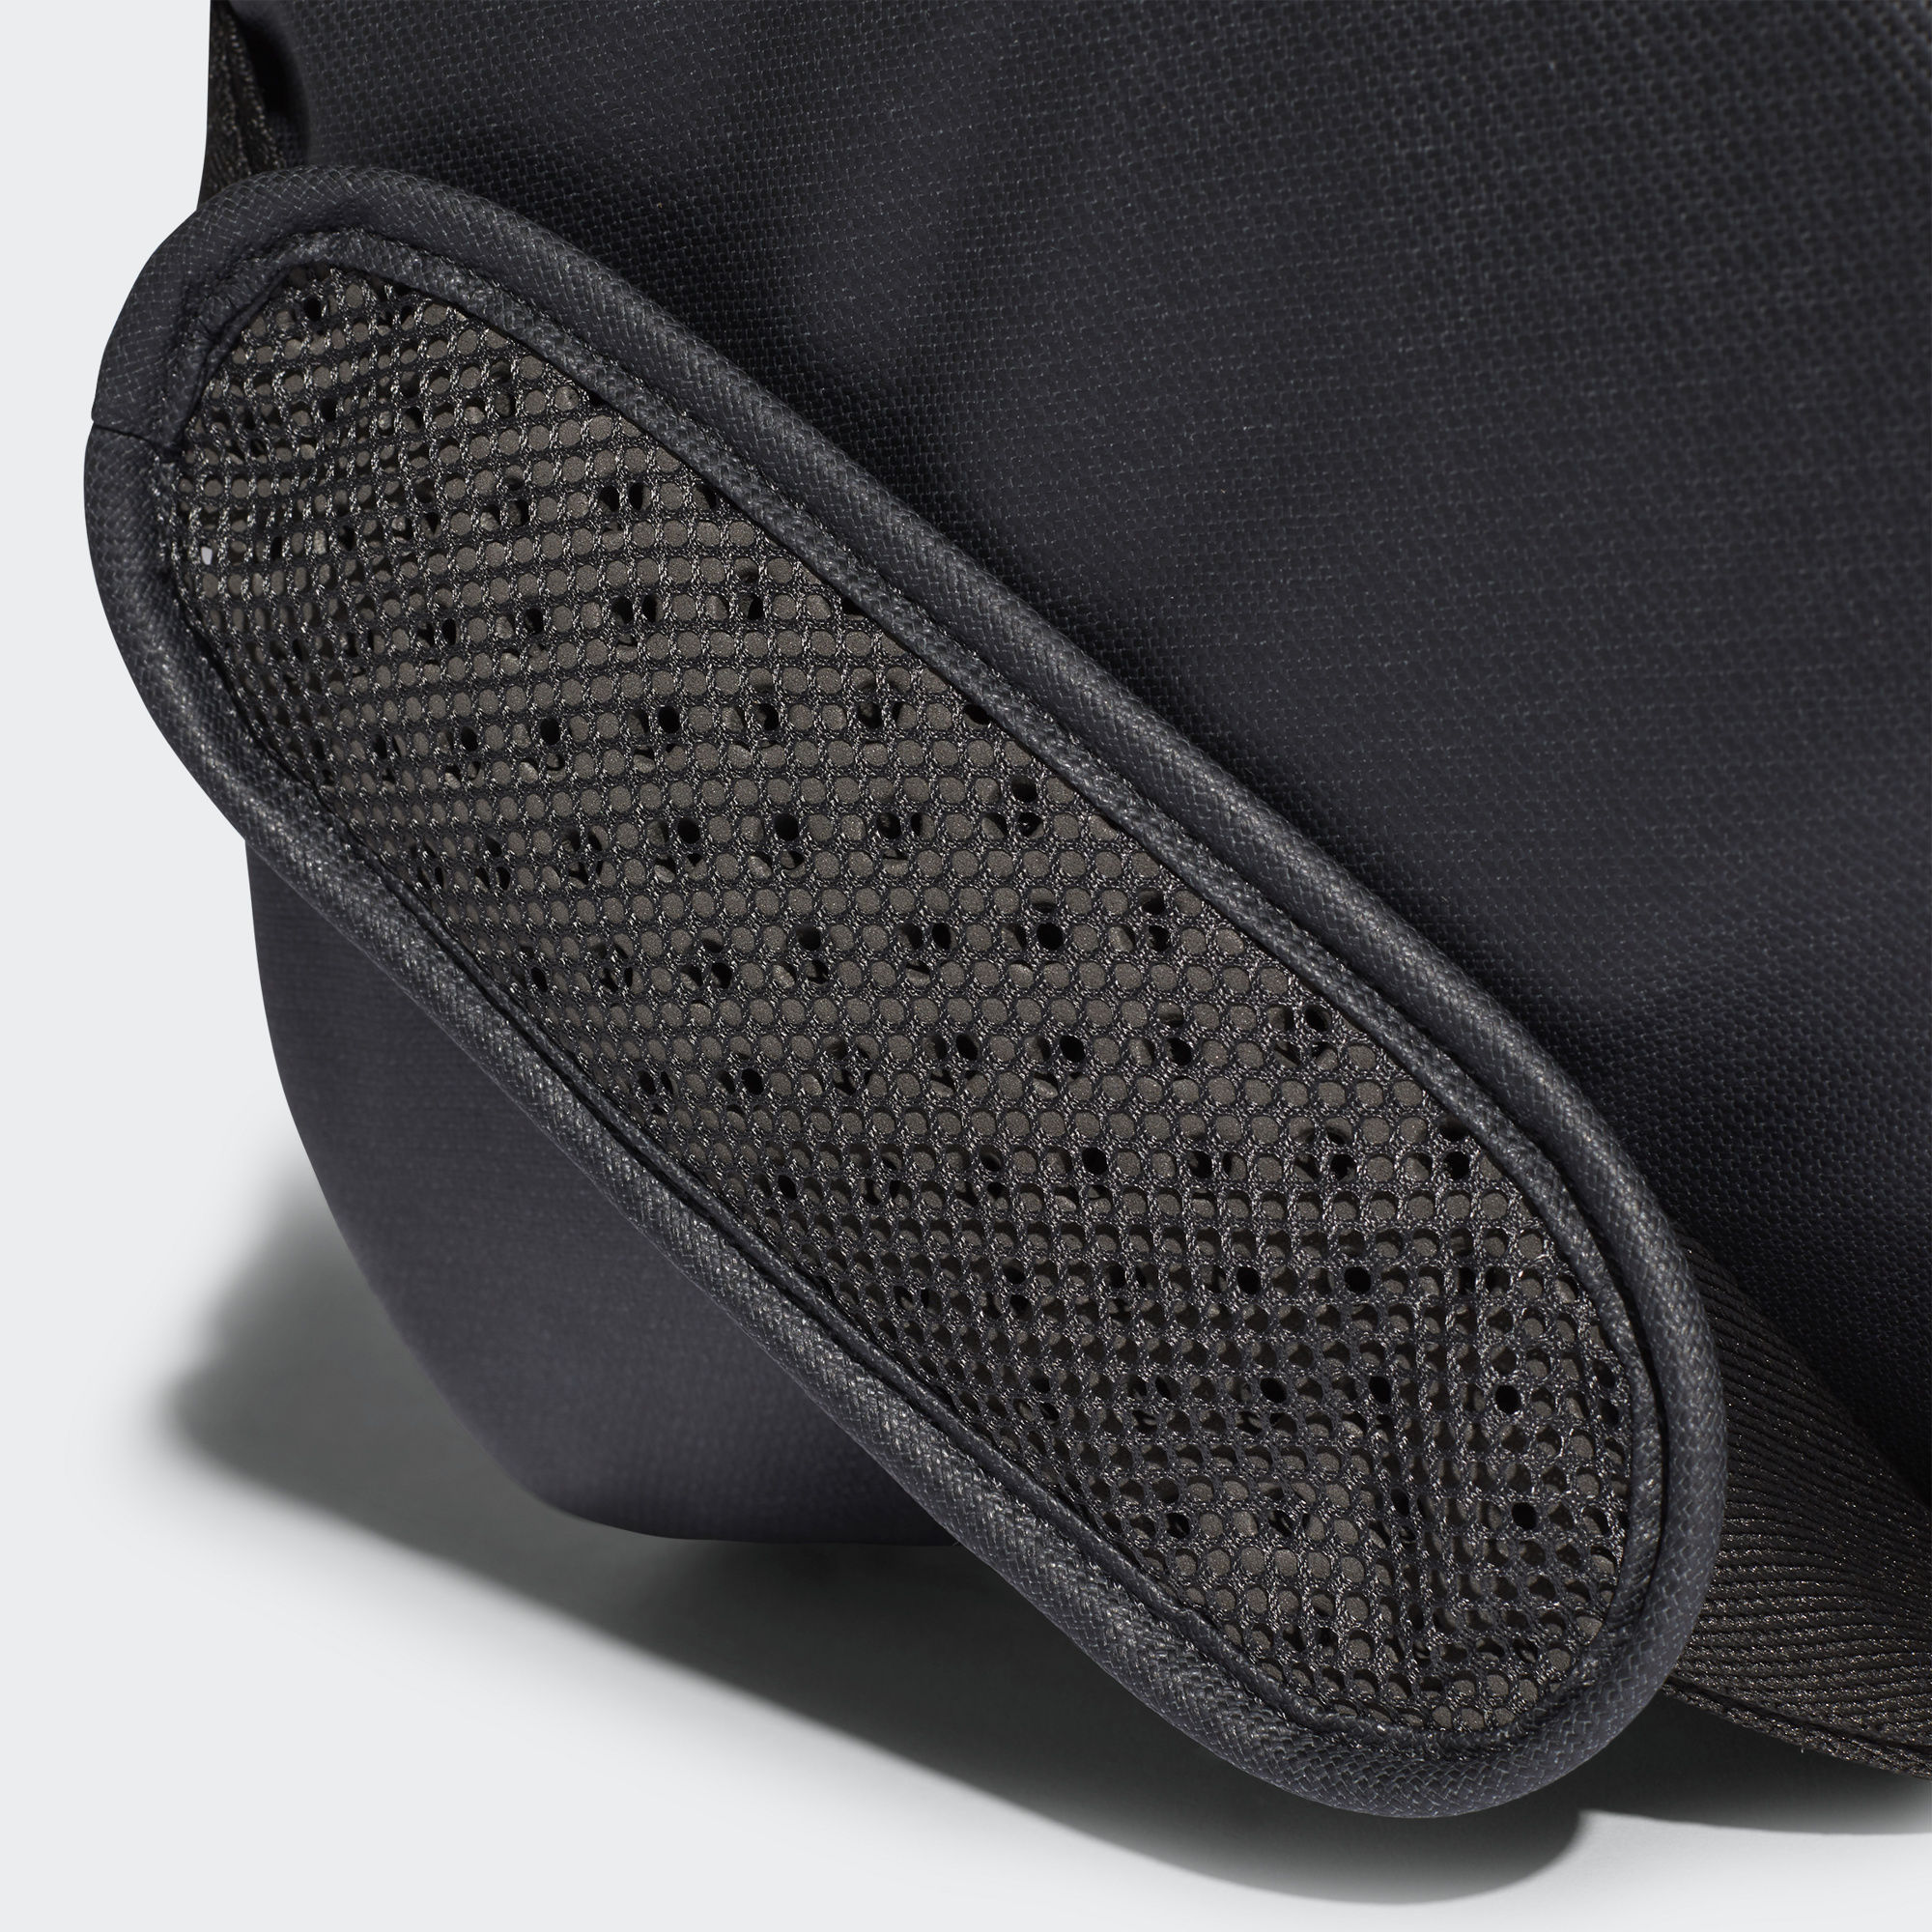 cab59a8d311f Спортивная сумка Convertible Training CW0115 adidas Performance ...